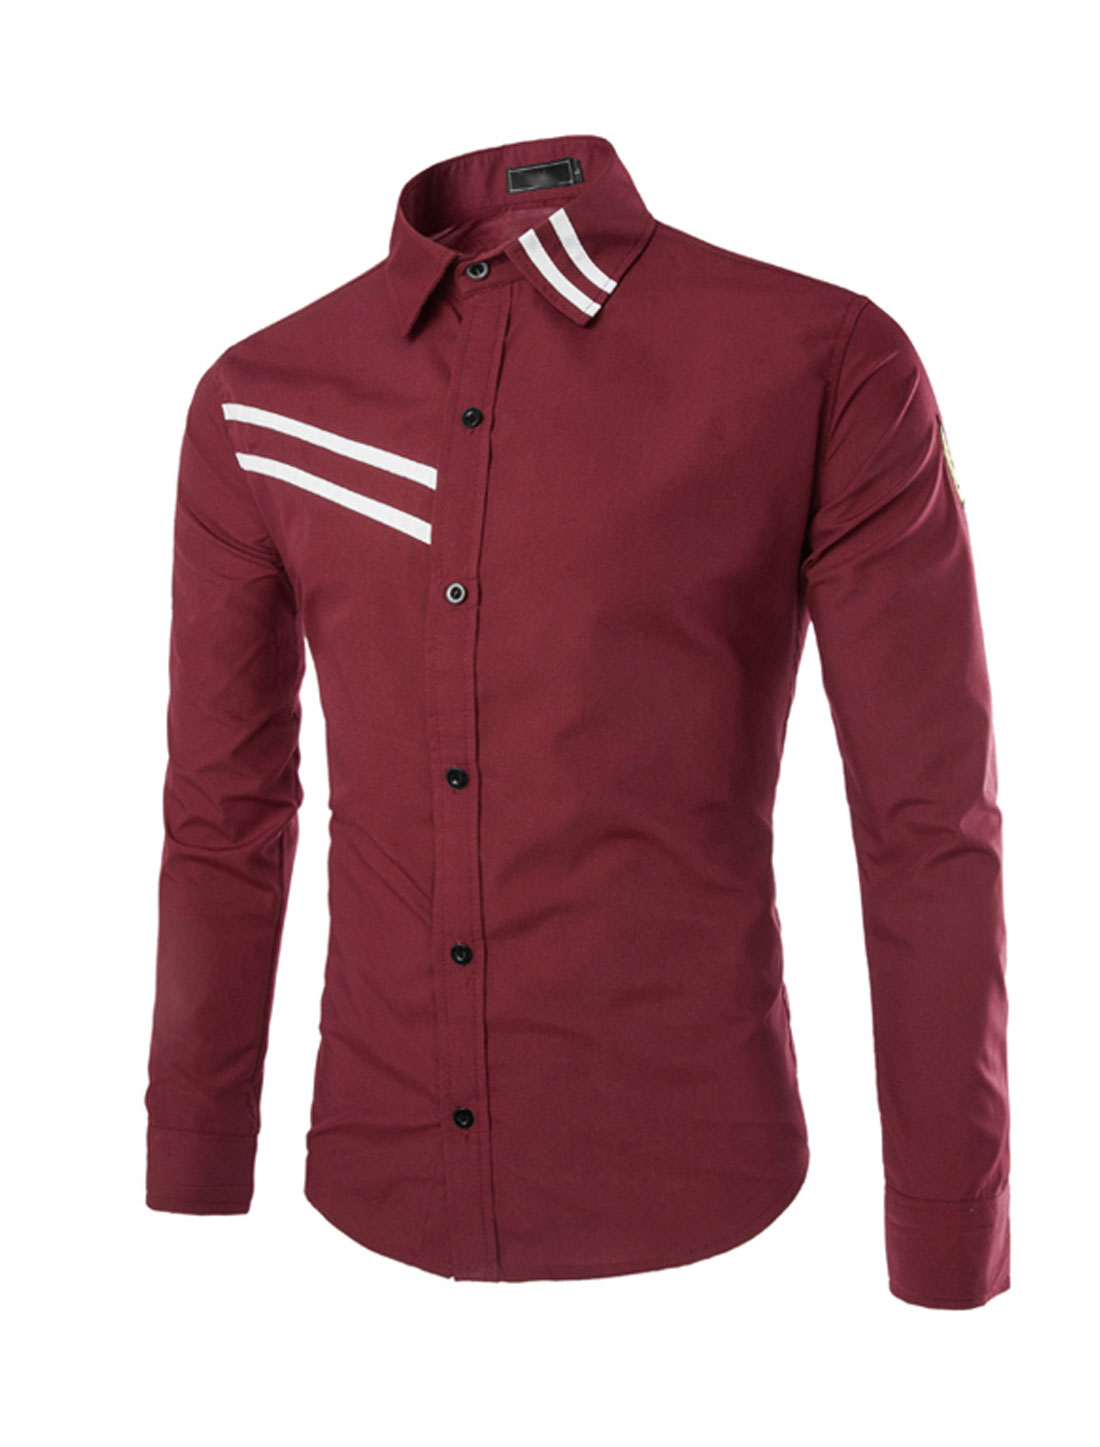 Men Point Collar Button Down Stripes Detail Shirts Burgundy S